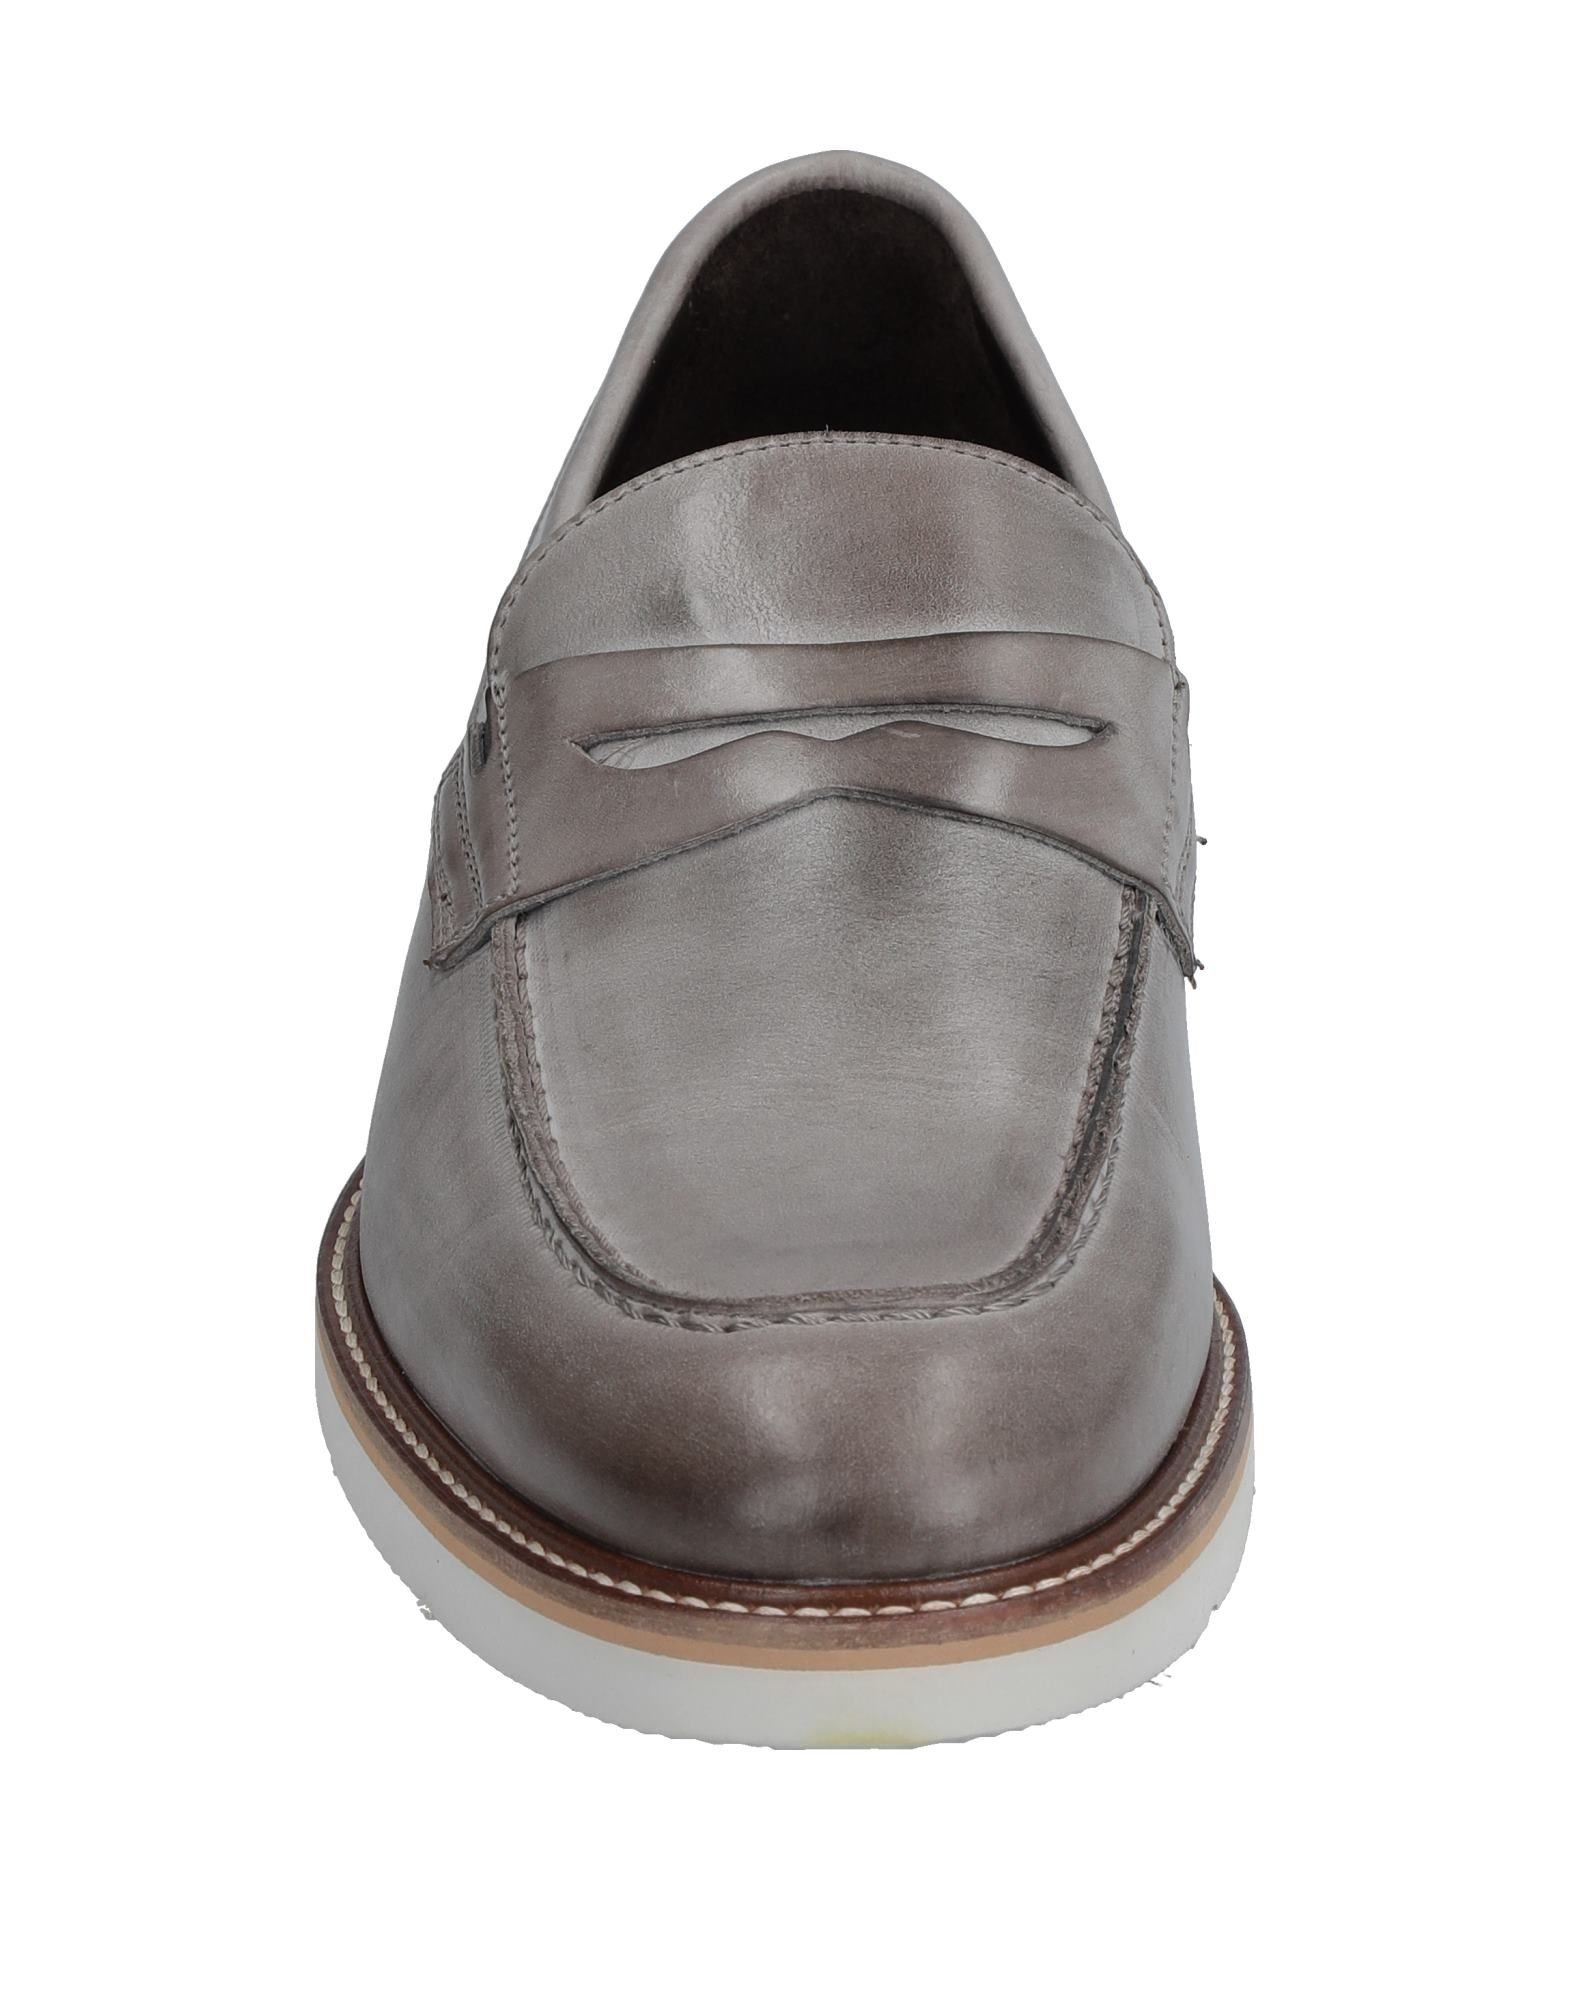 A.Testoni Mokassins 11543685QK Herren  11543685QK Mokassins Heiße Schuhe a67bb4